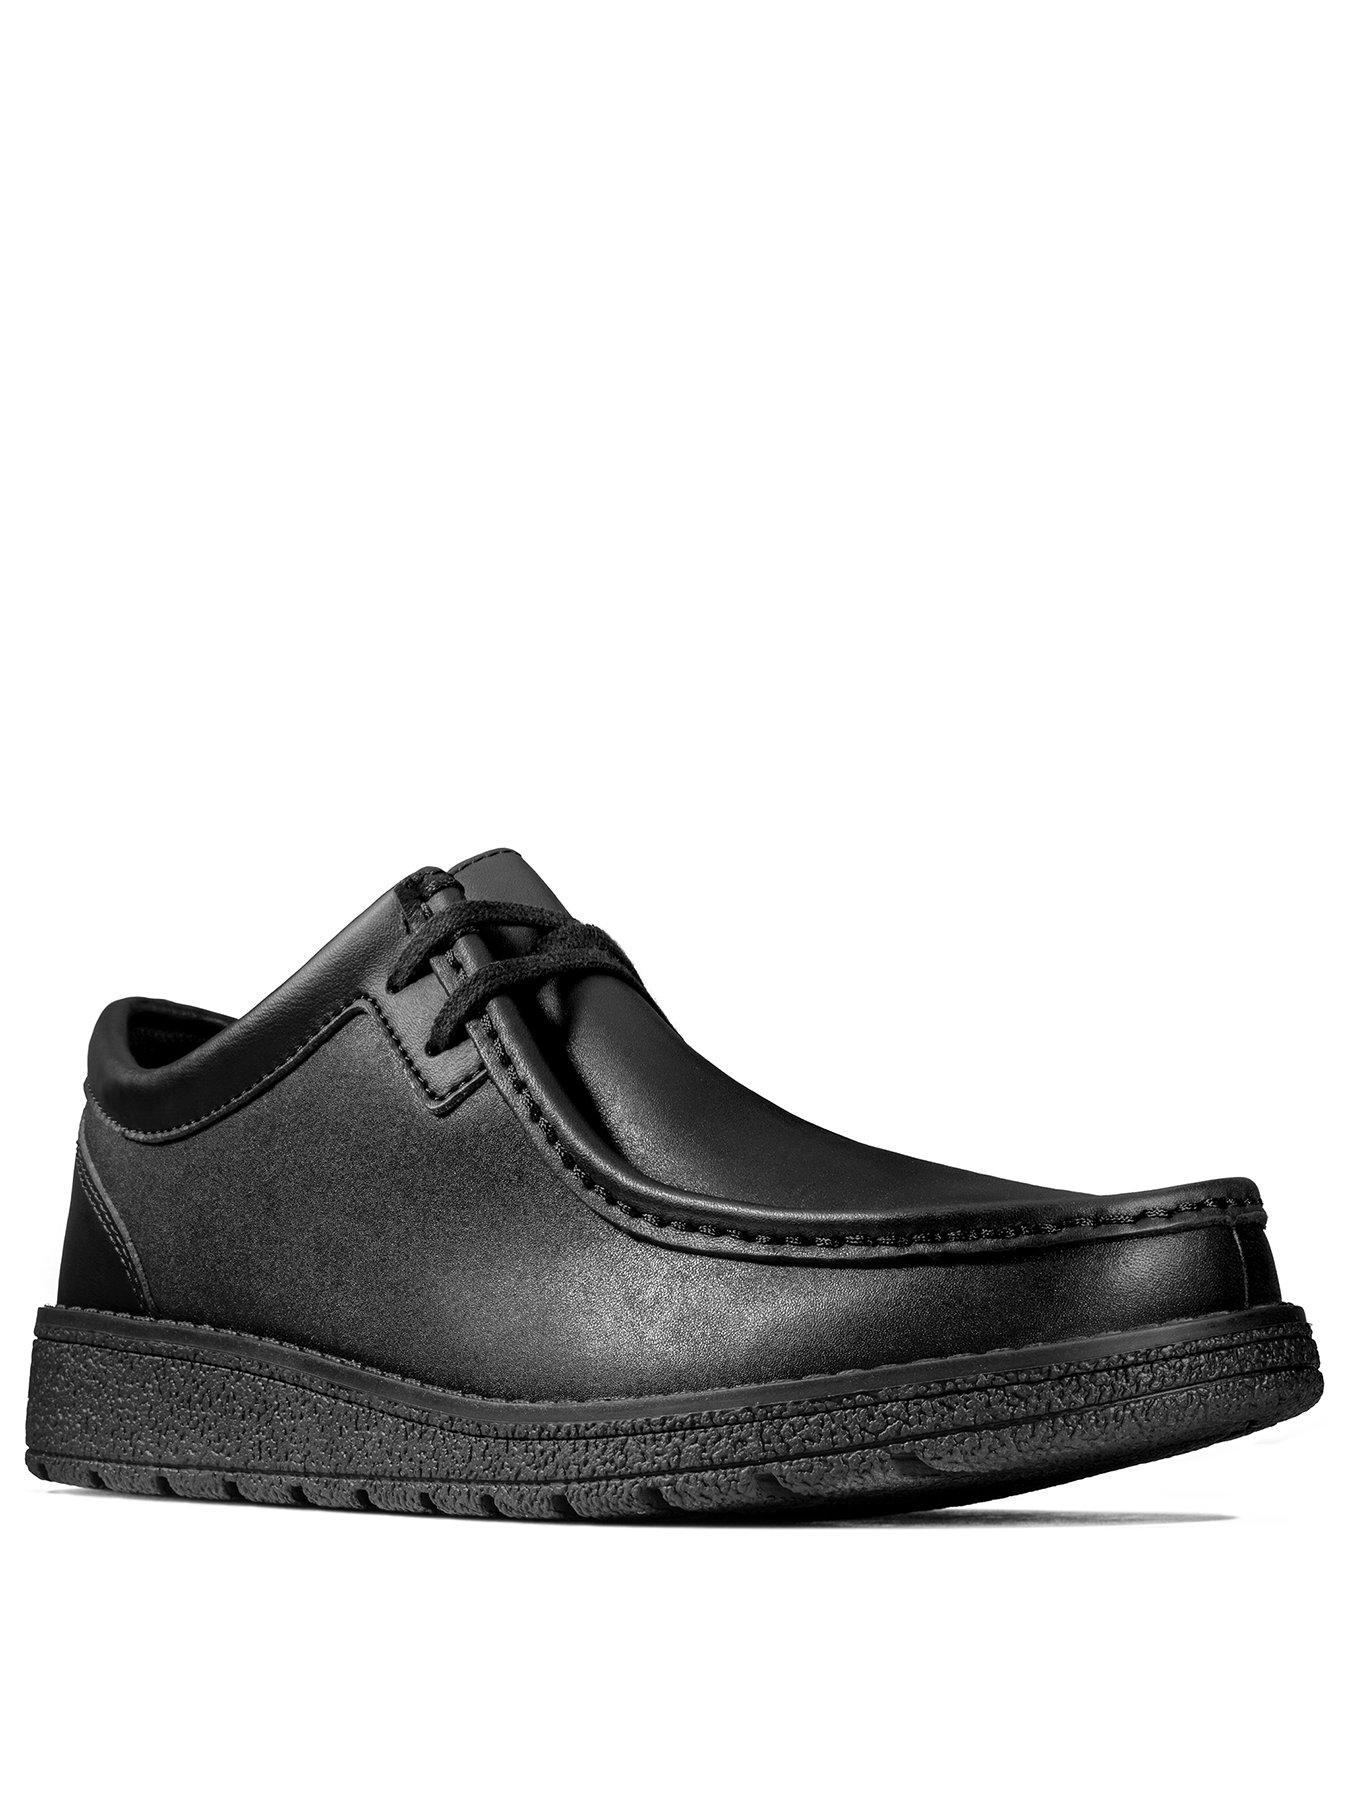 Clarks Boys Smart Lace Up School Shoes